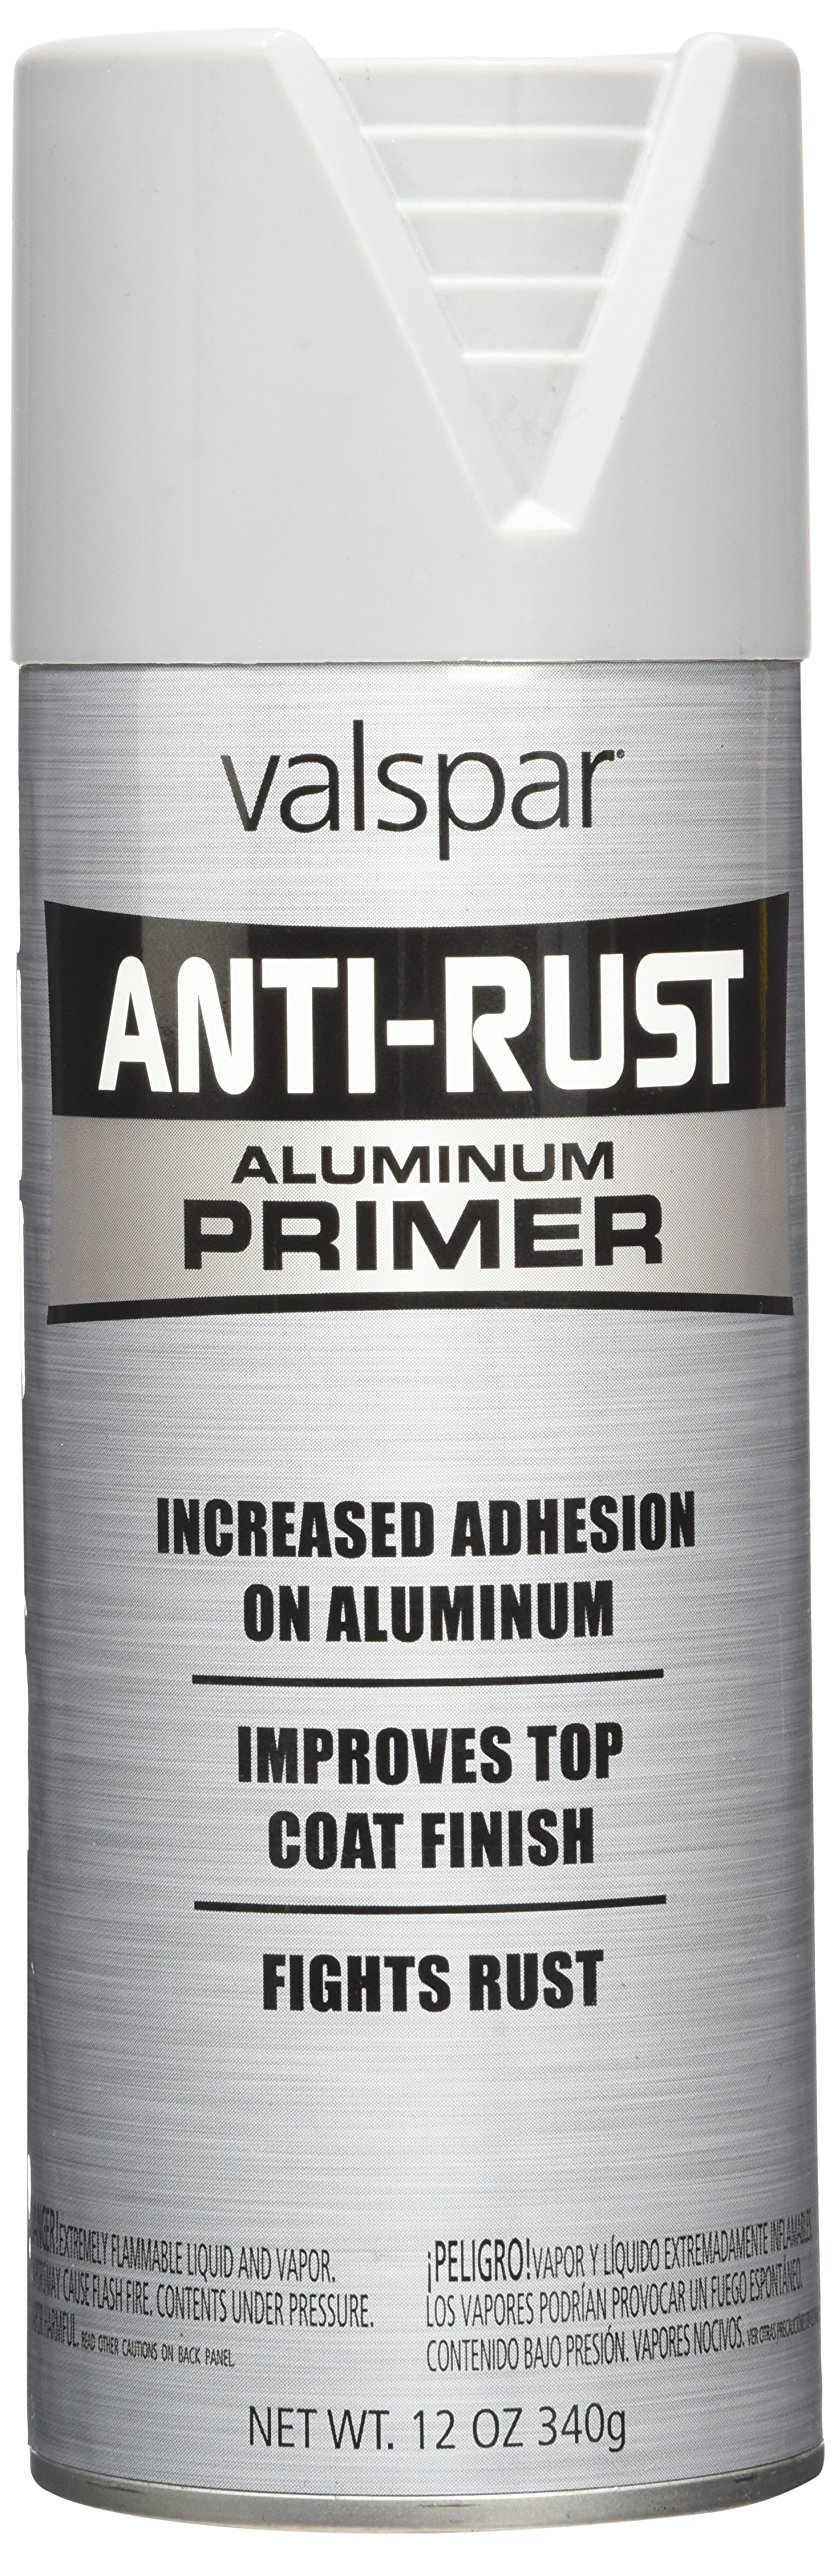 Valspar 68225 Aluminum Primer Enamel - 12 oz.